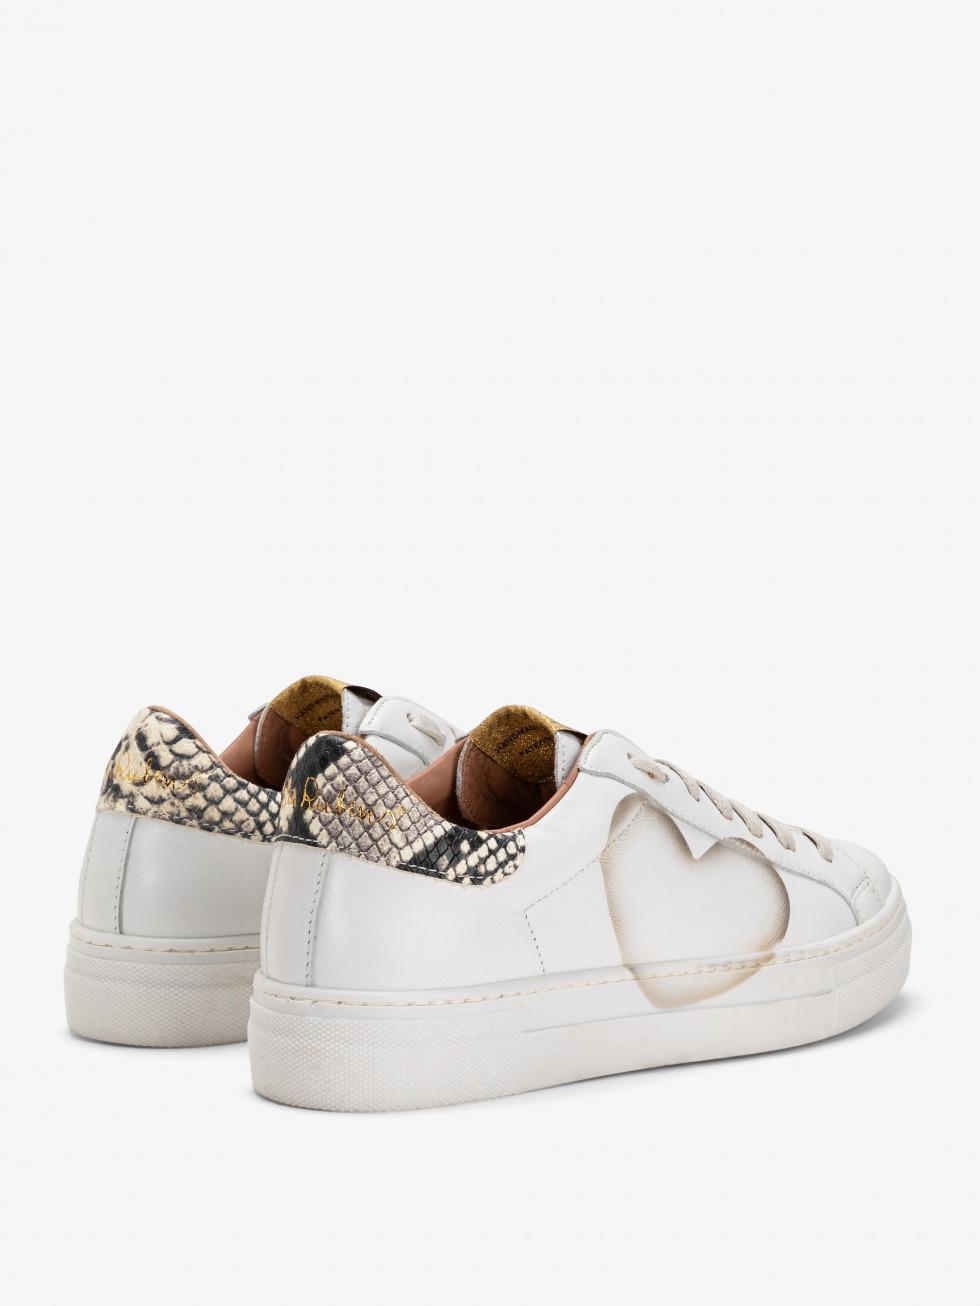 Martini Python Sneakers - Heart